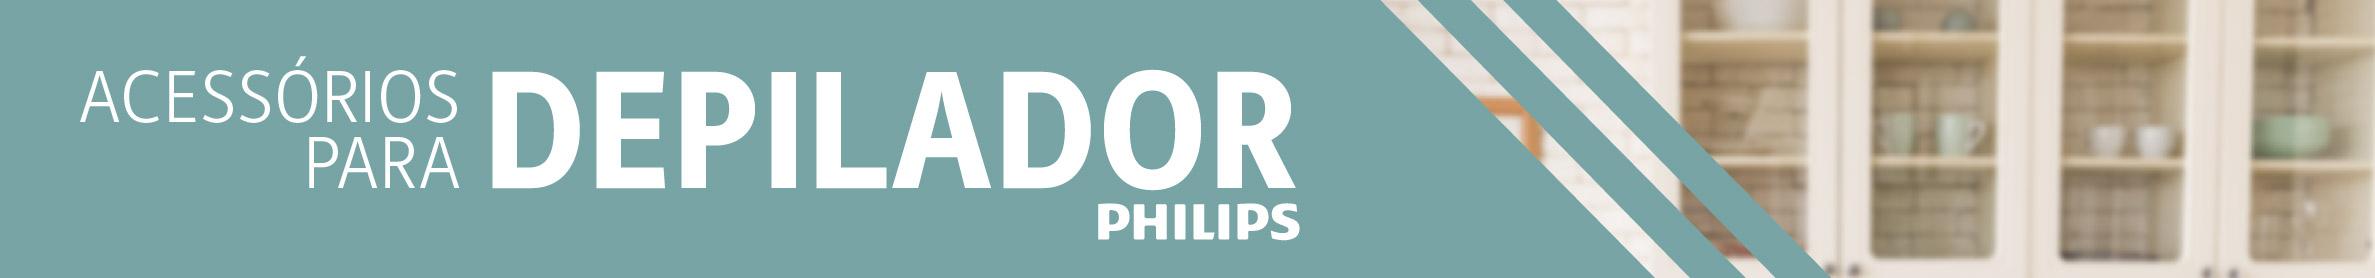 depilador-philips